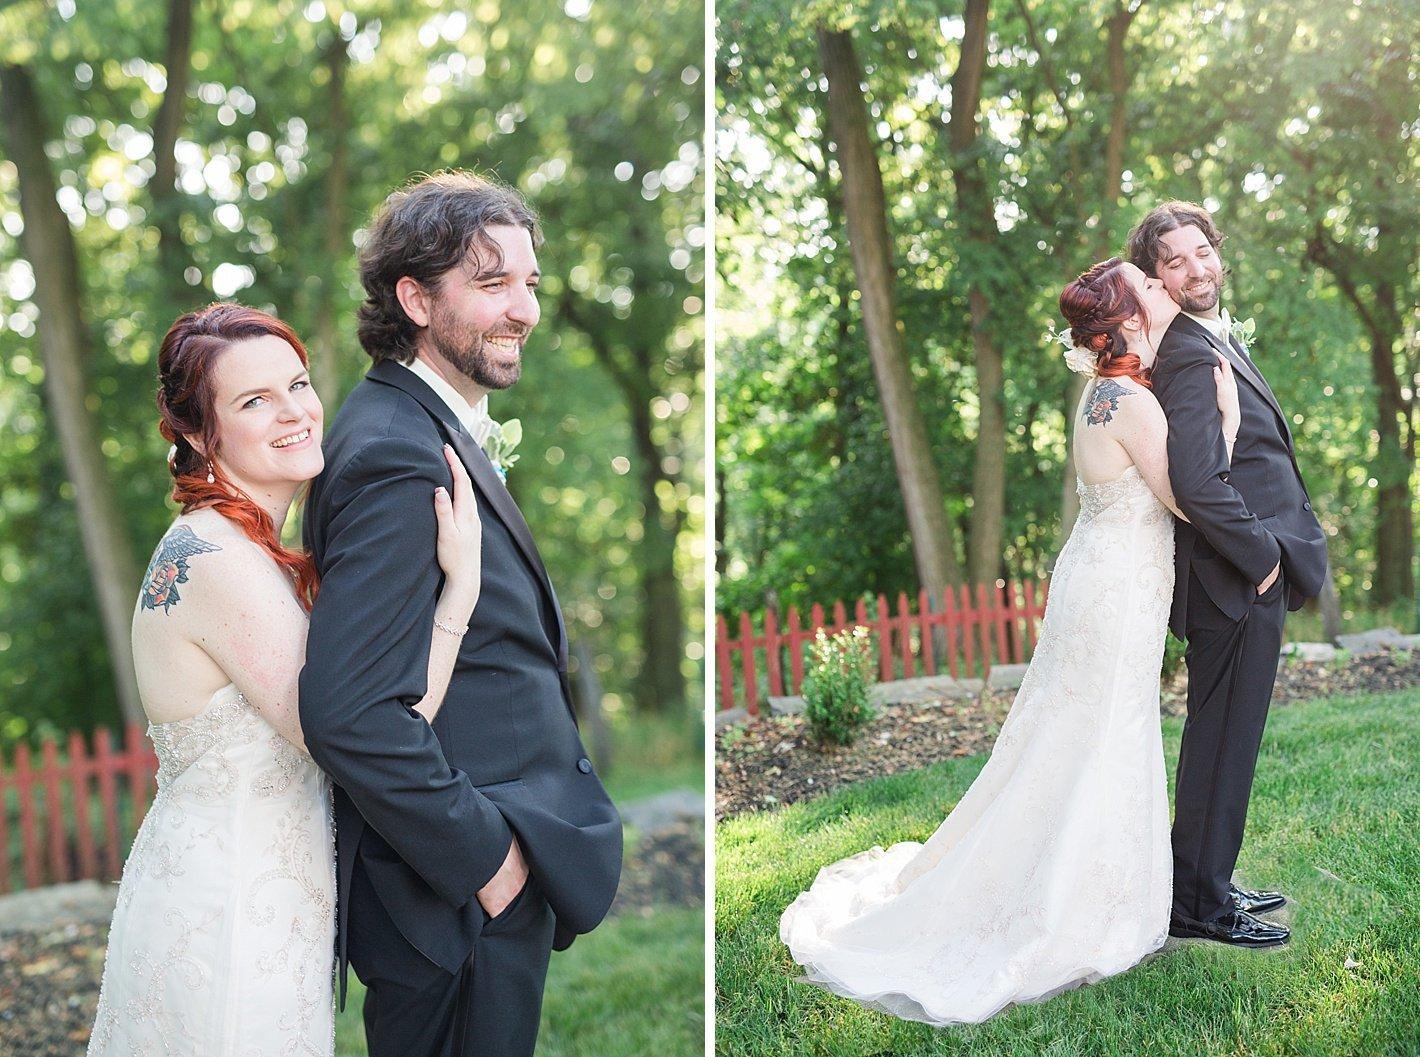 OverhillsMansionweddingphotographybaltimoreweddingphotographerarpasiphotography-53